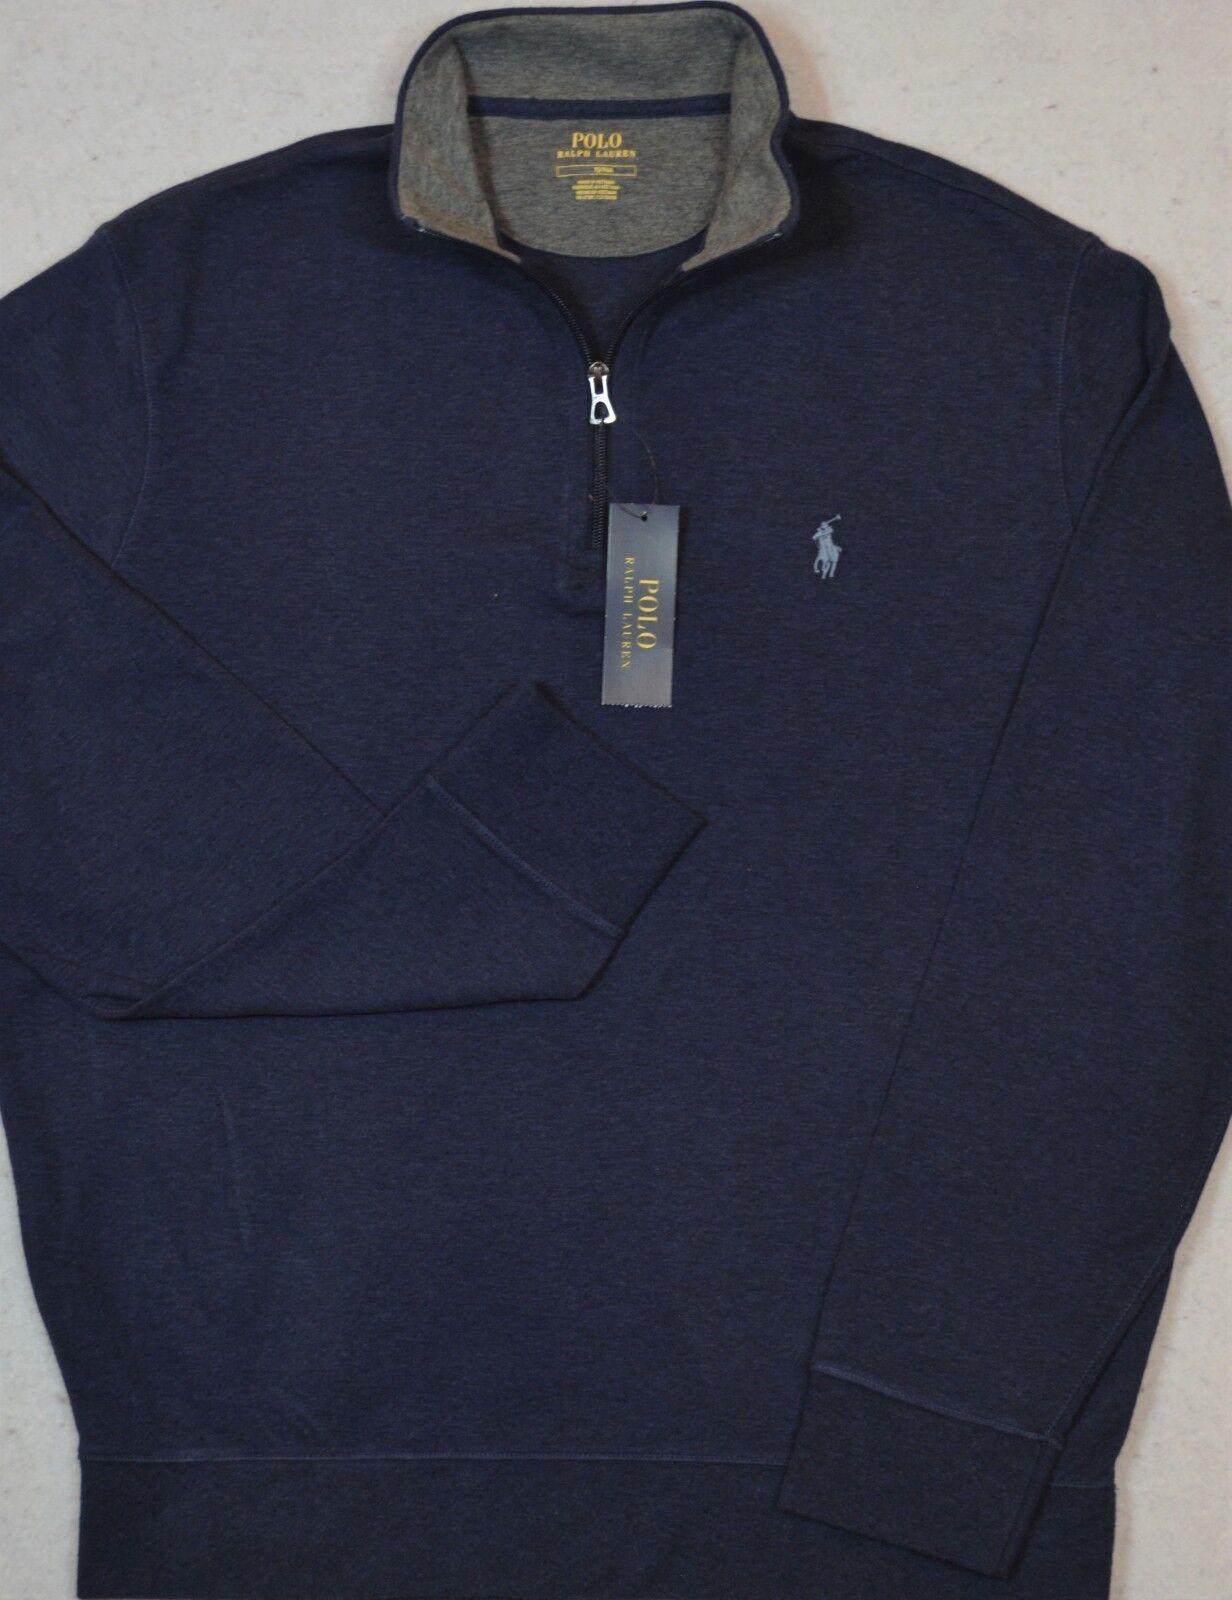 Polo Ralph Lauren Jersey Pullover Navy 1/2 Half-Zip M Medium New NWT